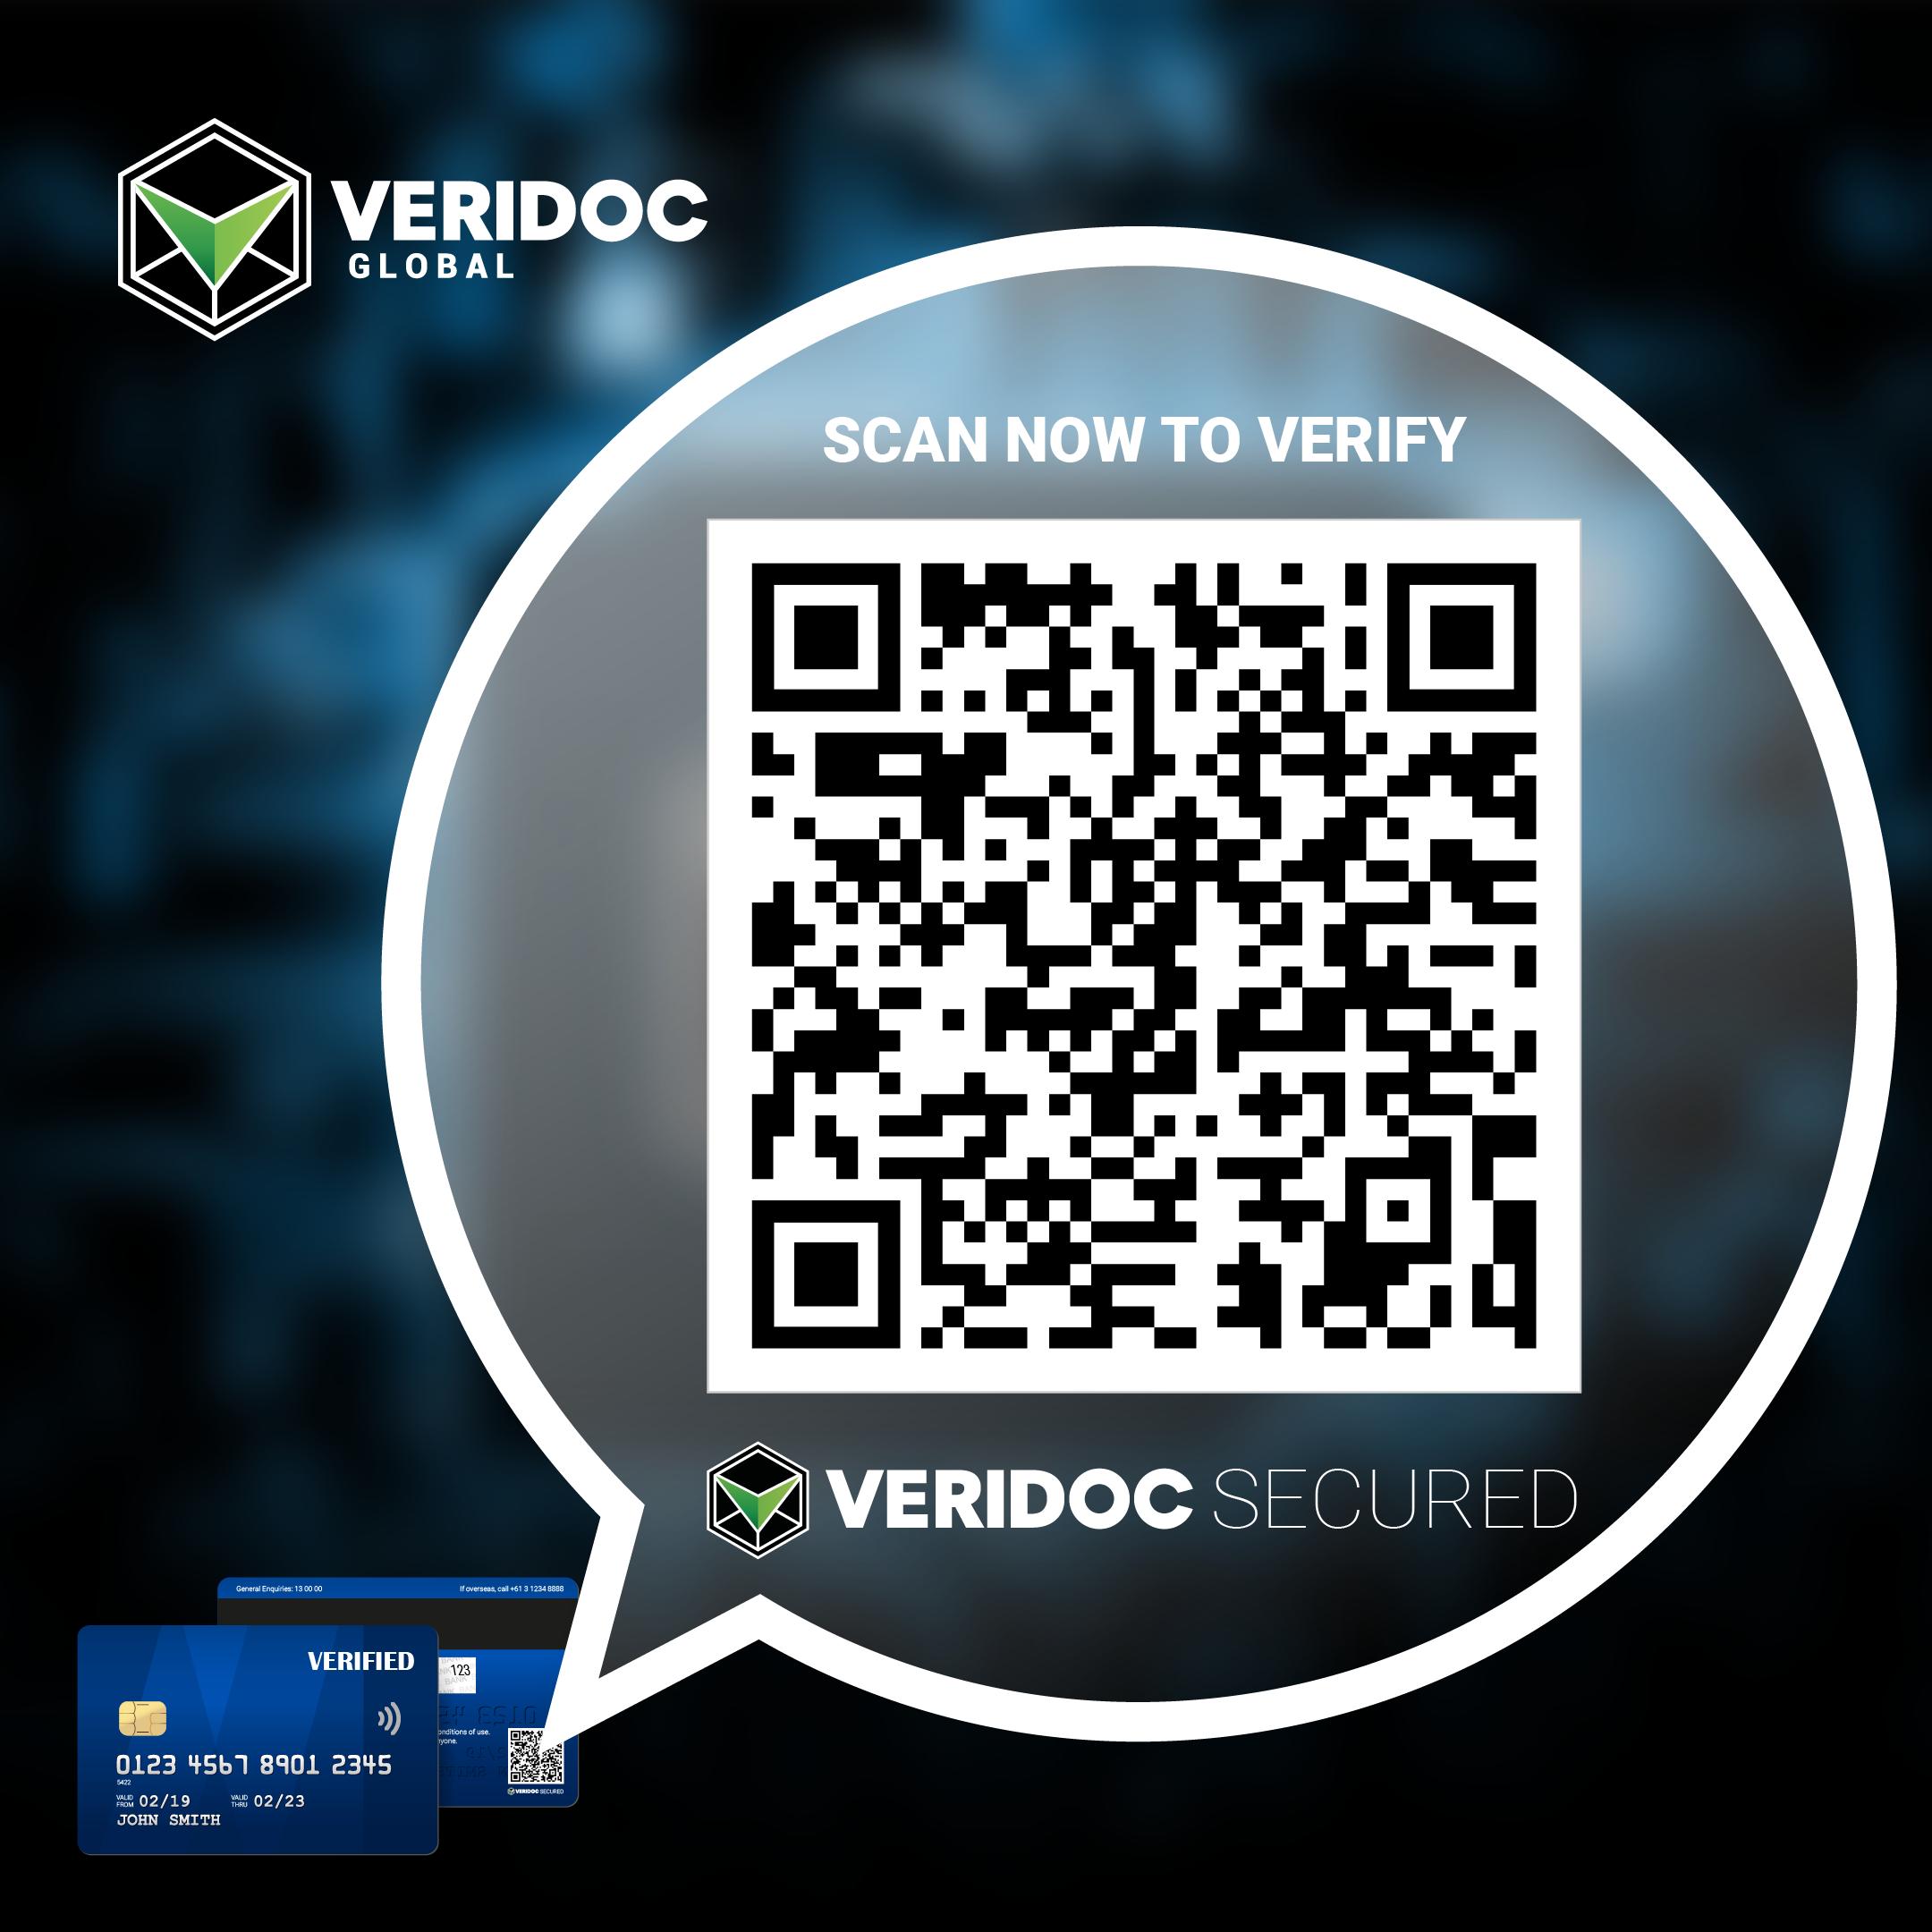 Securedcreditcard